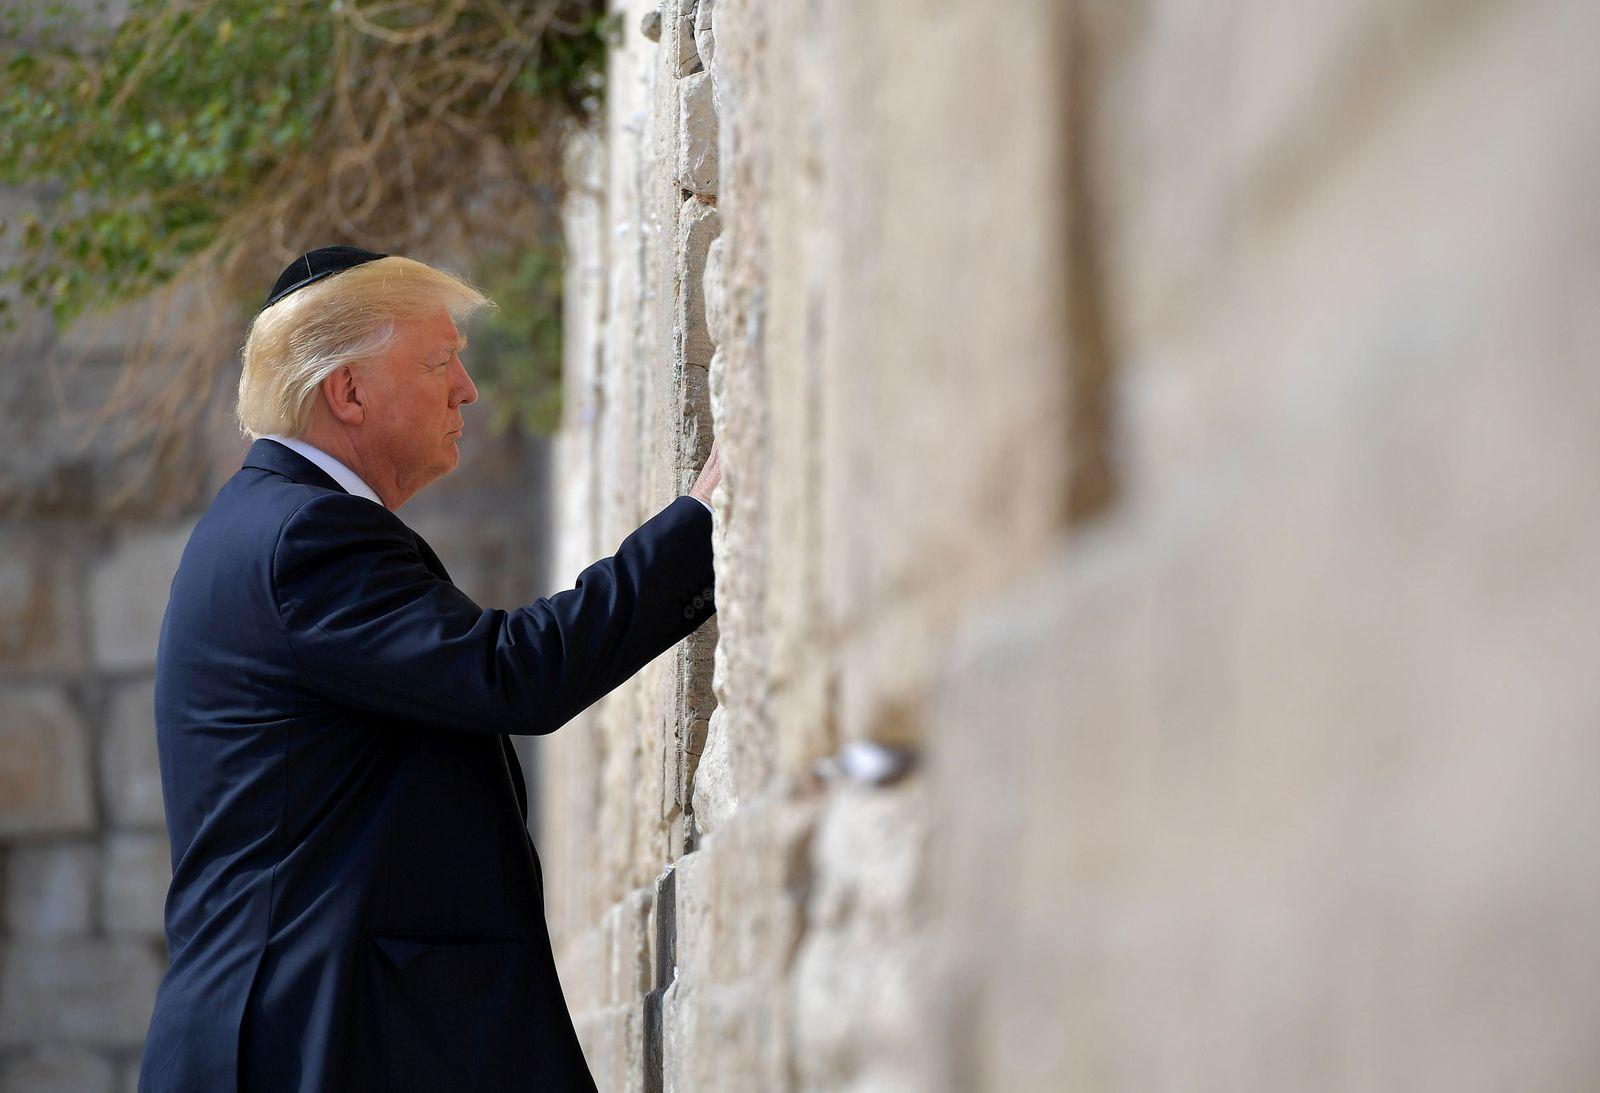 Israel / Donald Trump / Klagemauer